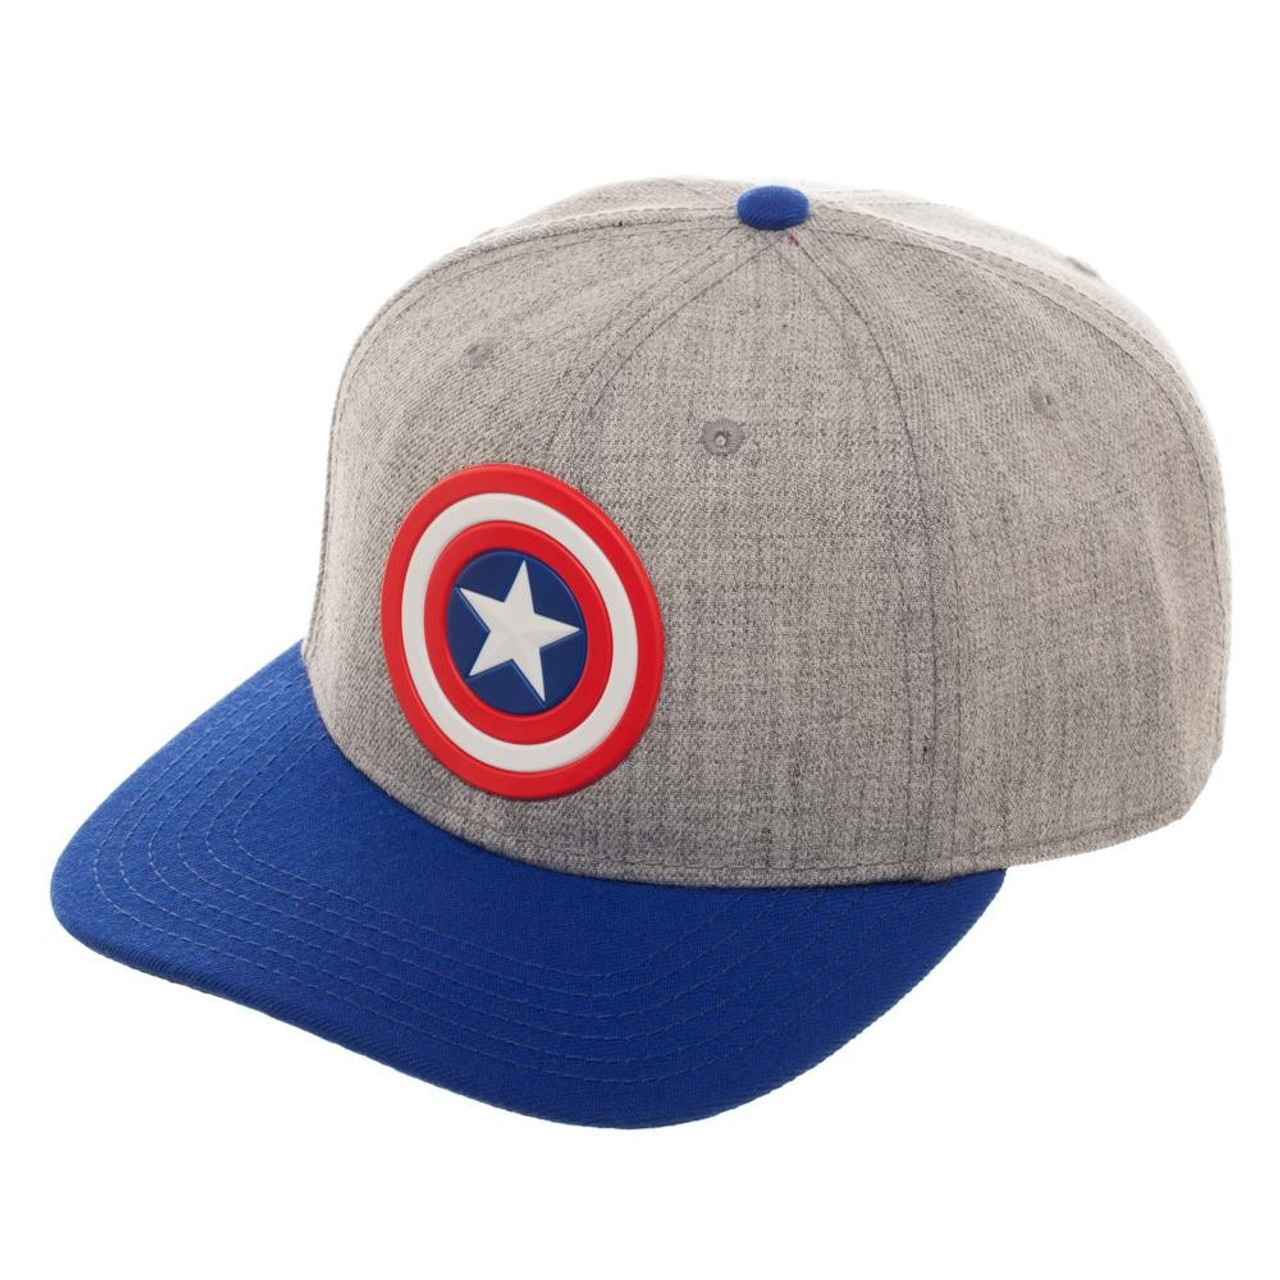 info for 13853 f9364 Marvel Deadpool Captain America Logo Curved Snapback Cap Bioworld - ToyWiz